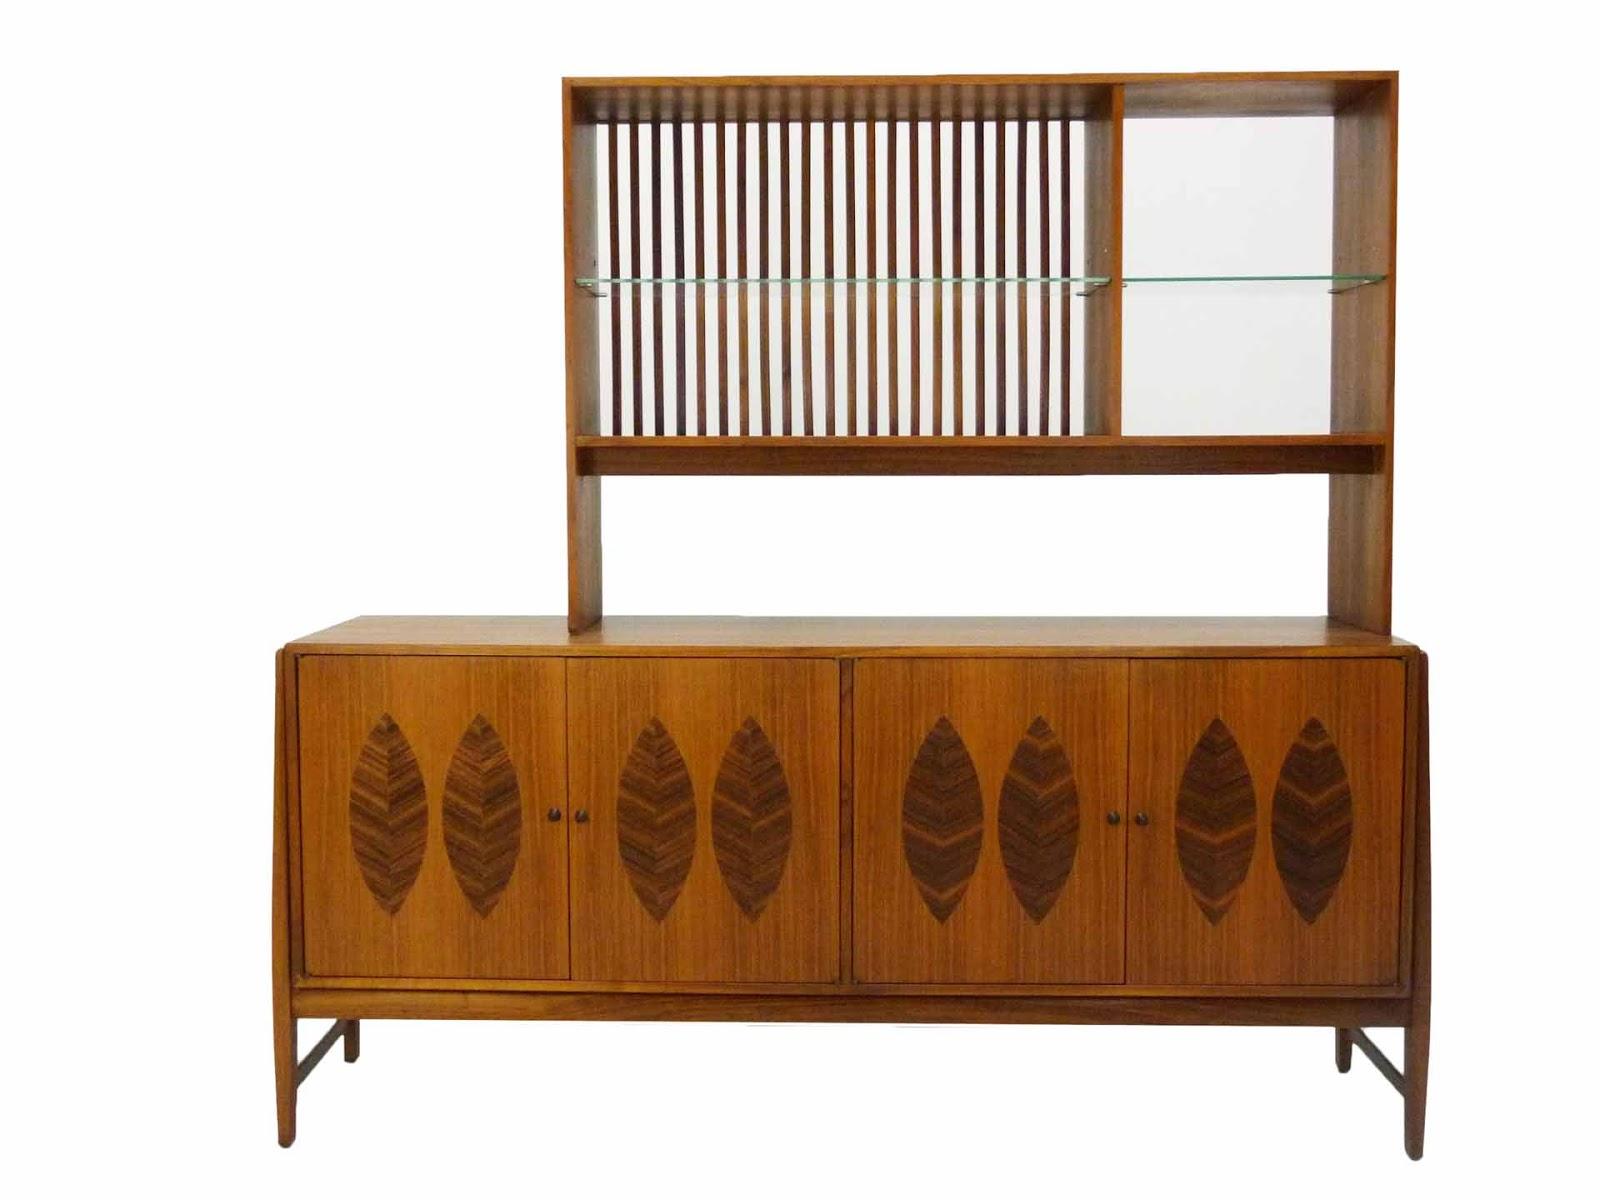 Kipp Stewart For Calvin Furniture Teak U0026 Rosewood Sideboard American Design  Foundation ...